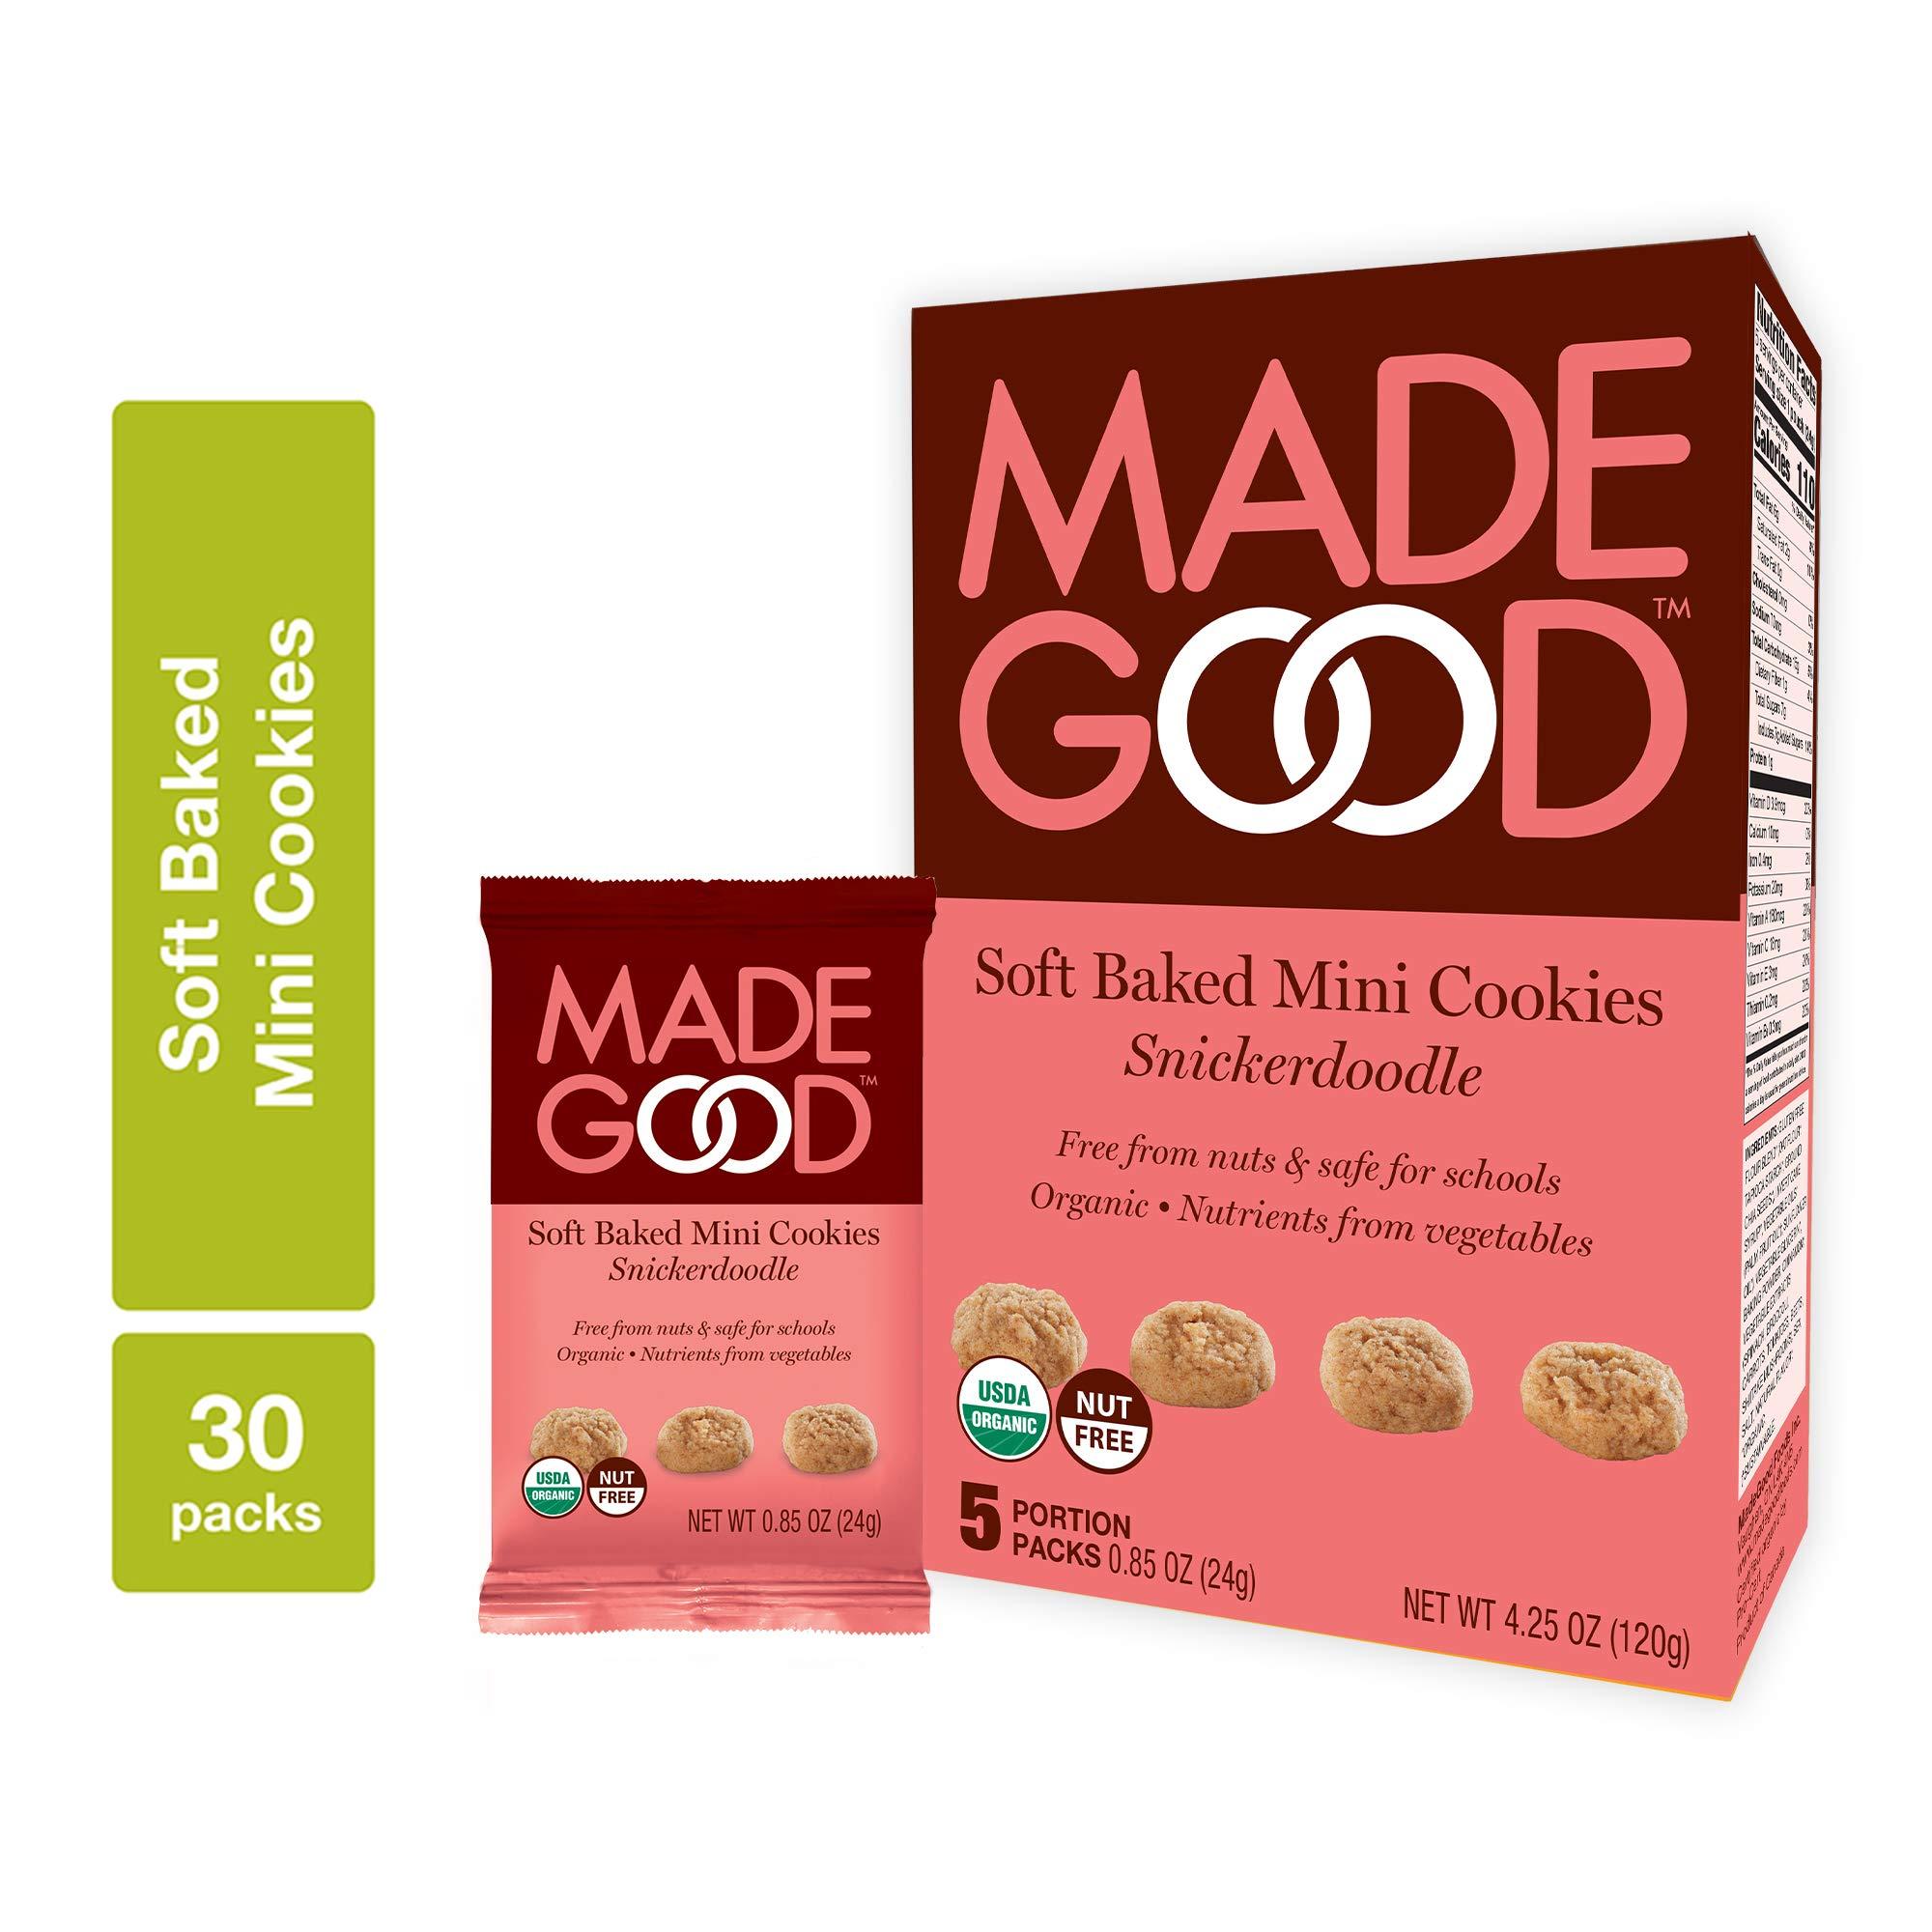 MadeGood Soft-Baked Cookies (Snickerdoodle)